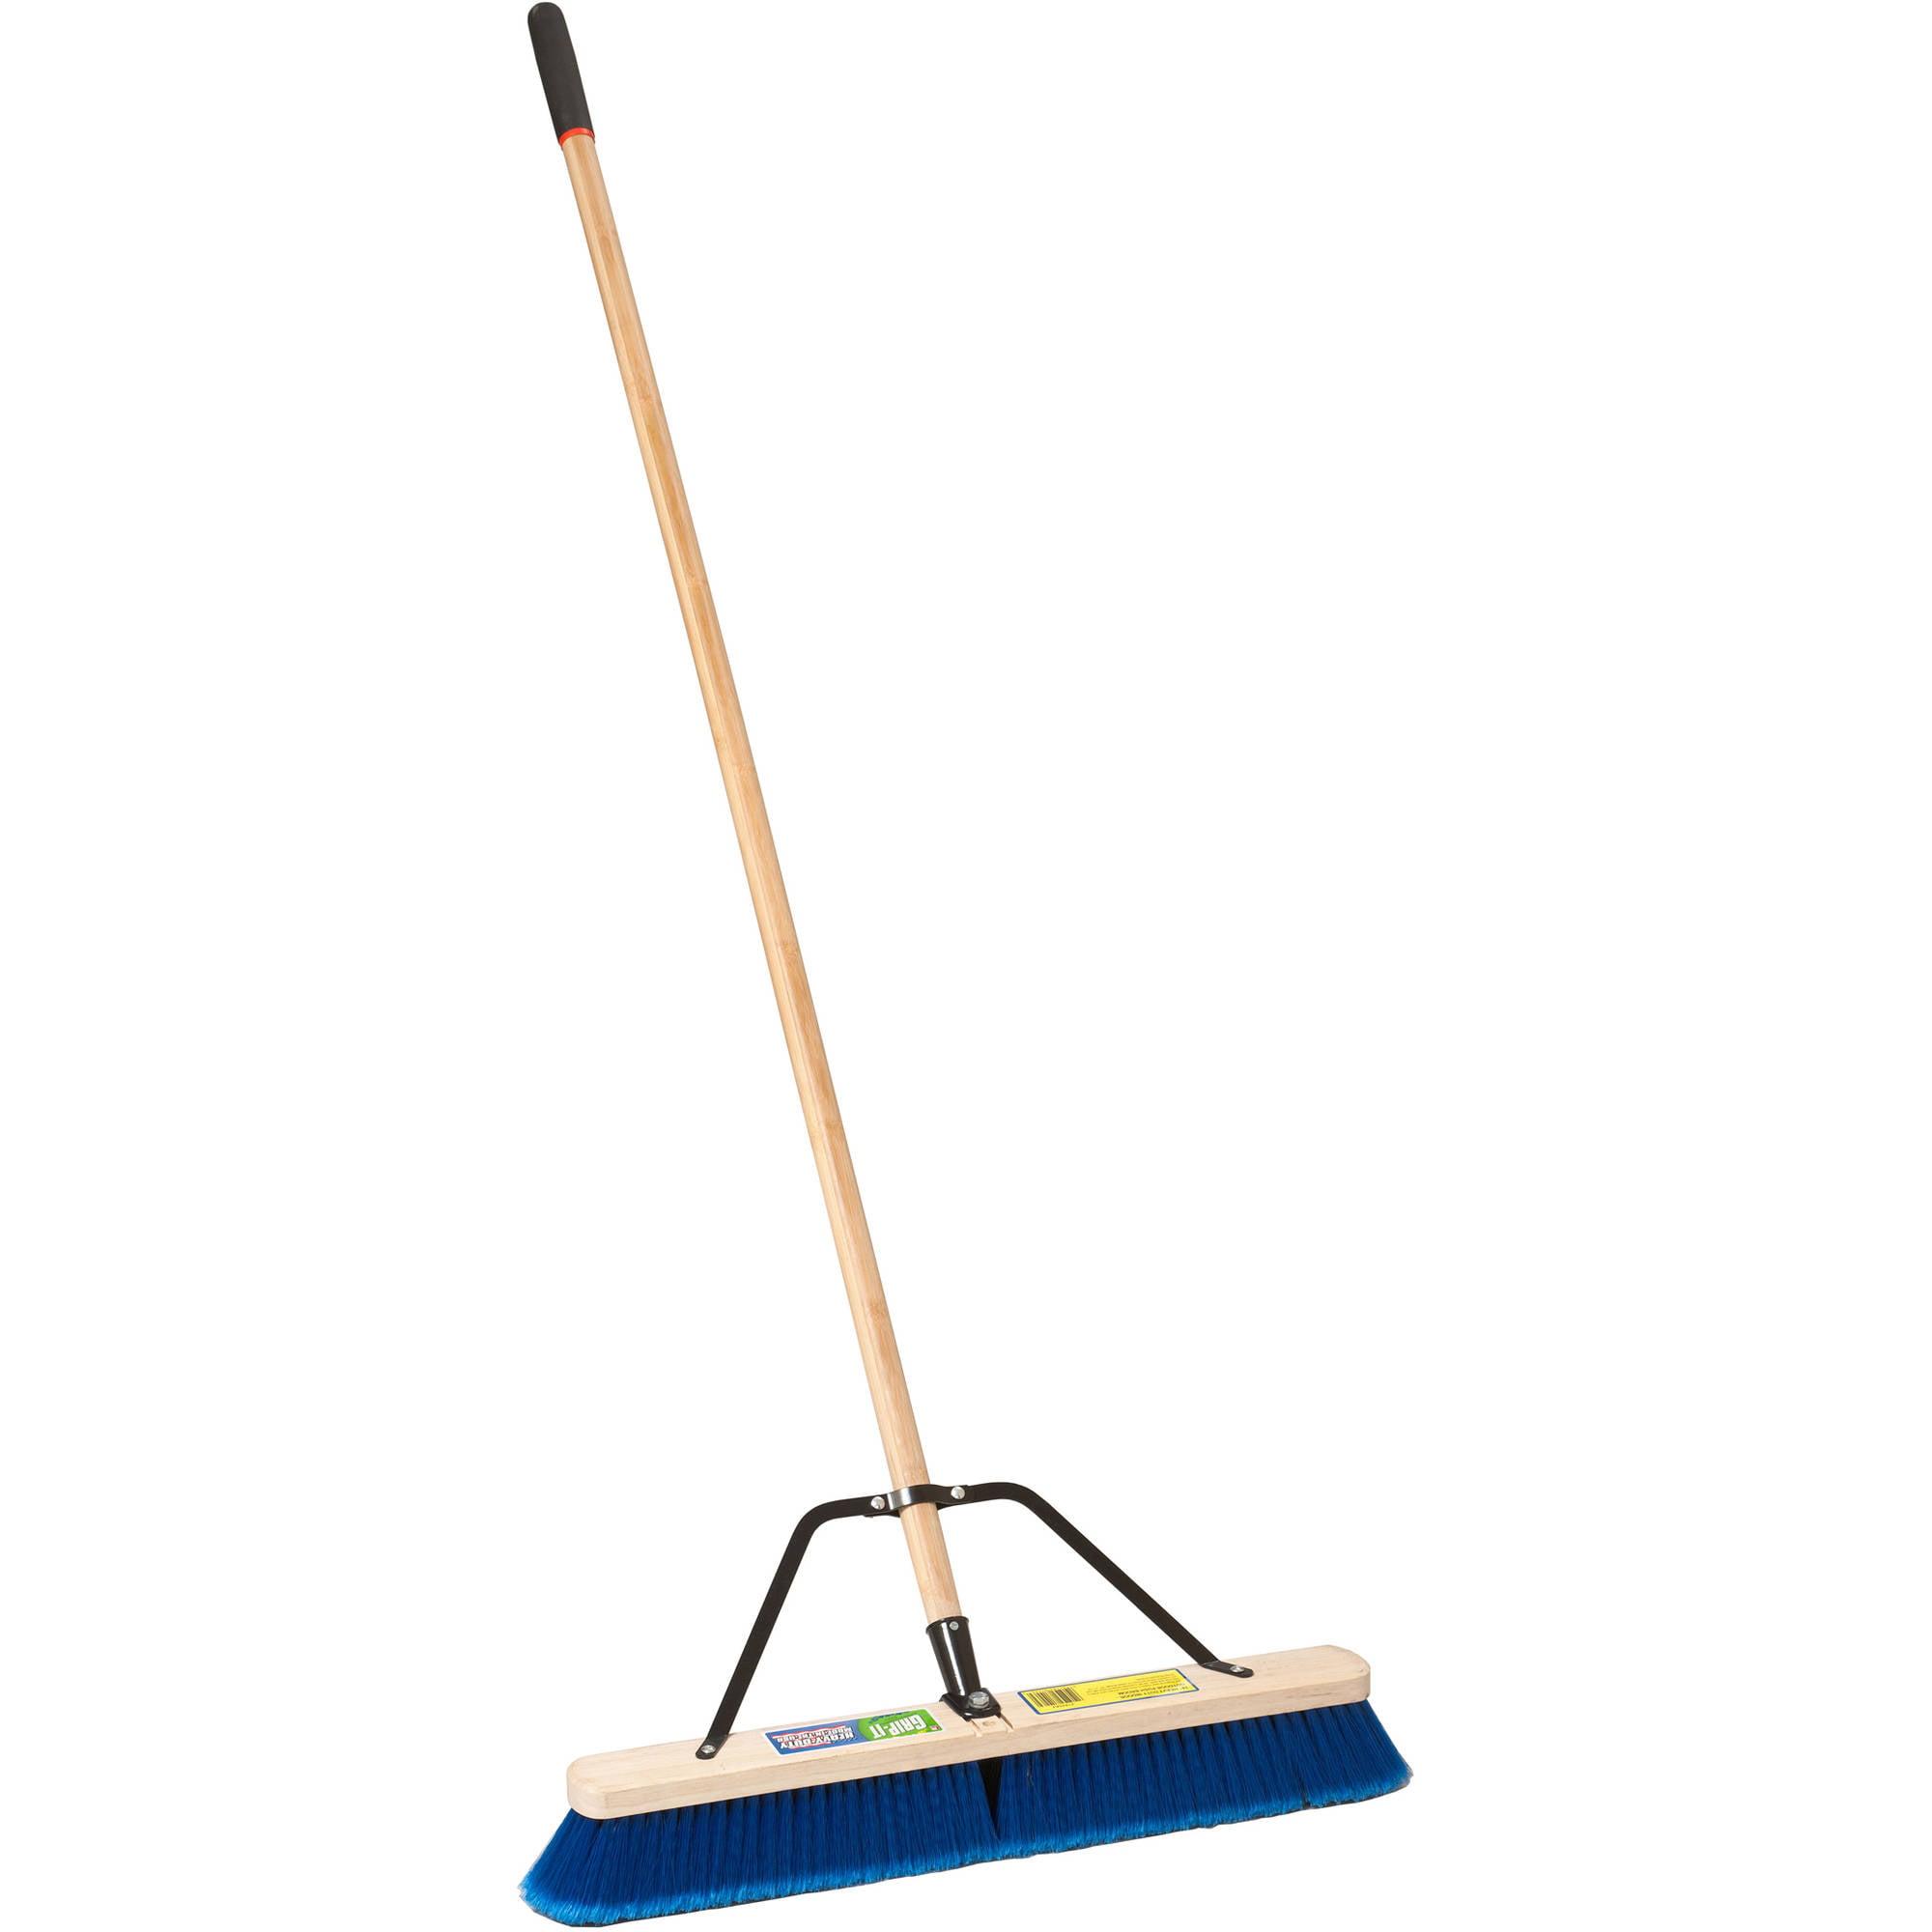 "Laitner Brush Company 1426AJ 24"" Multi Surface Push Broom by Cequent Laitner Company"